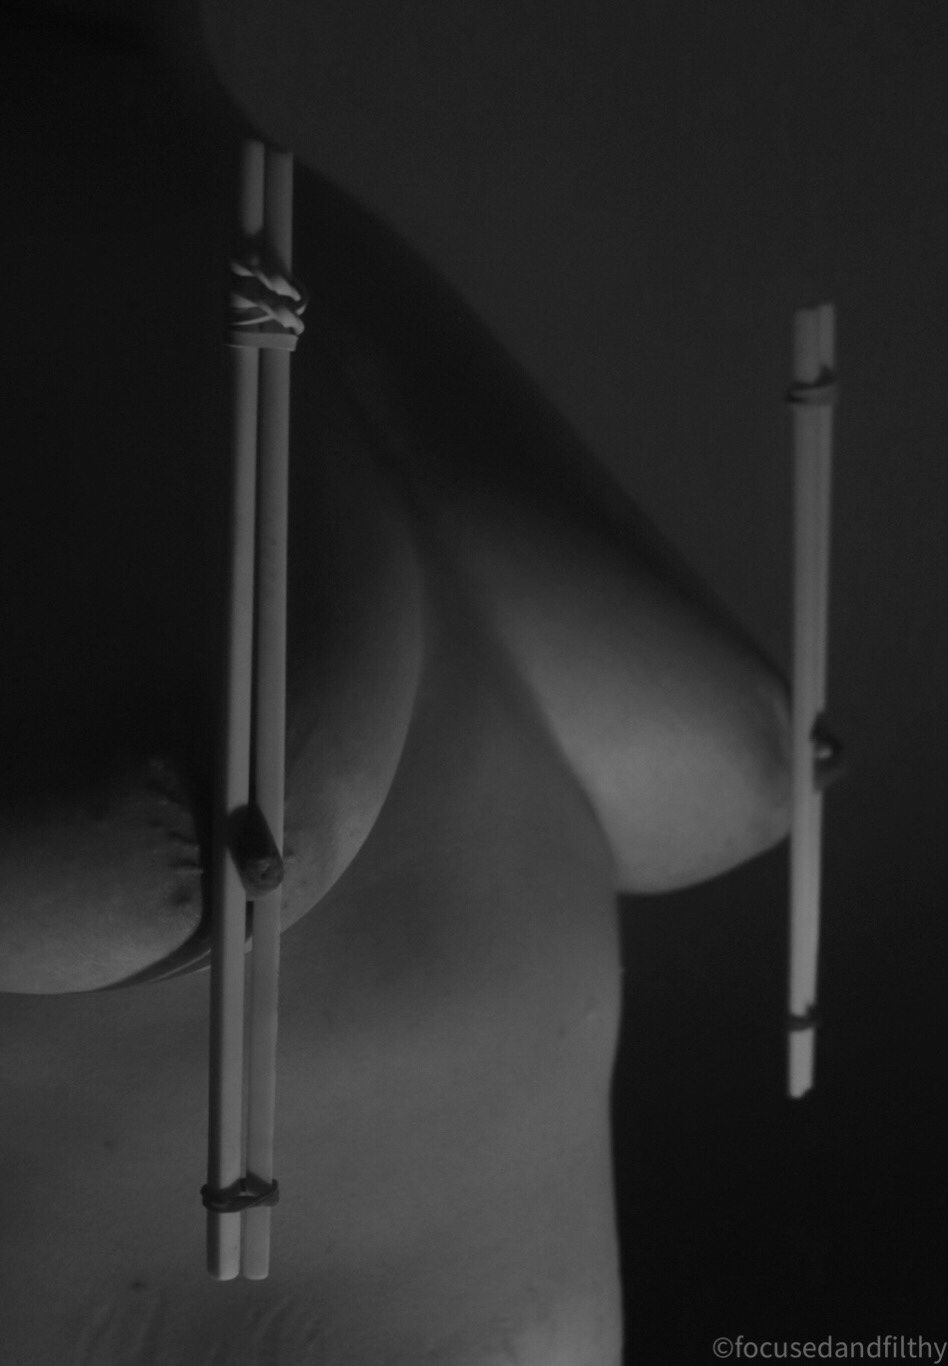 Chopstick clamps